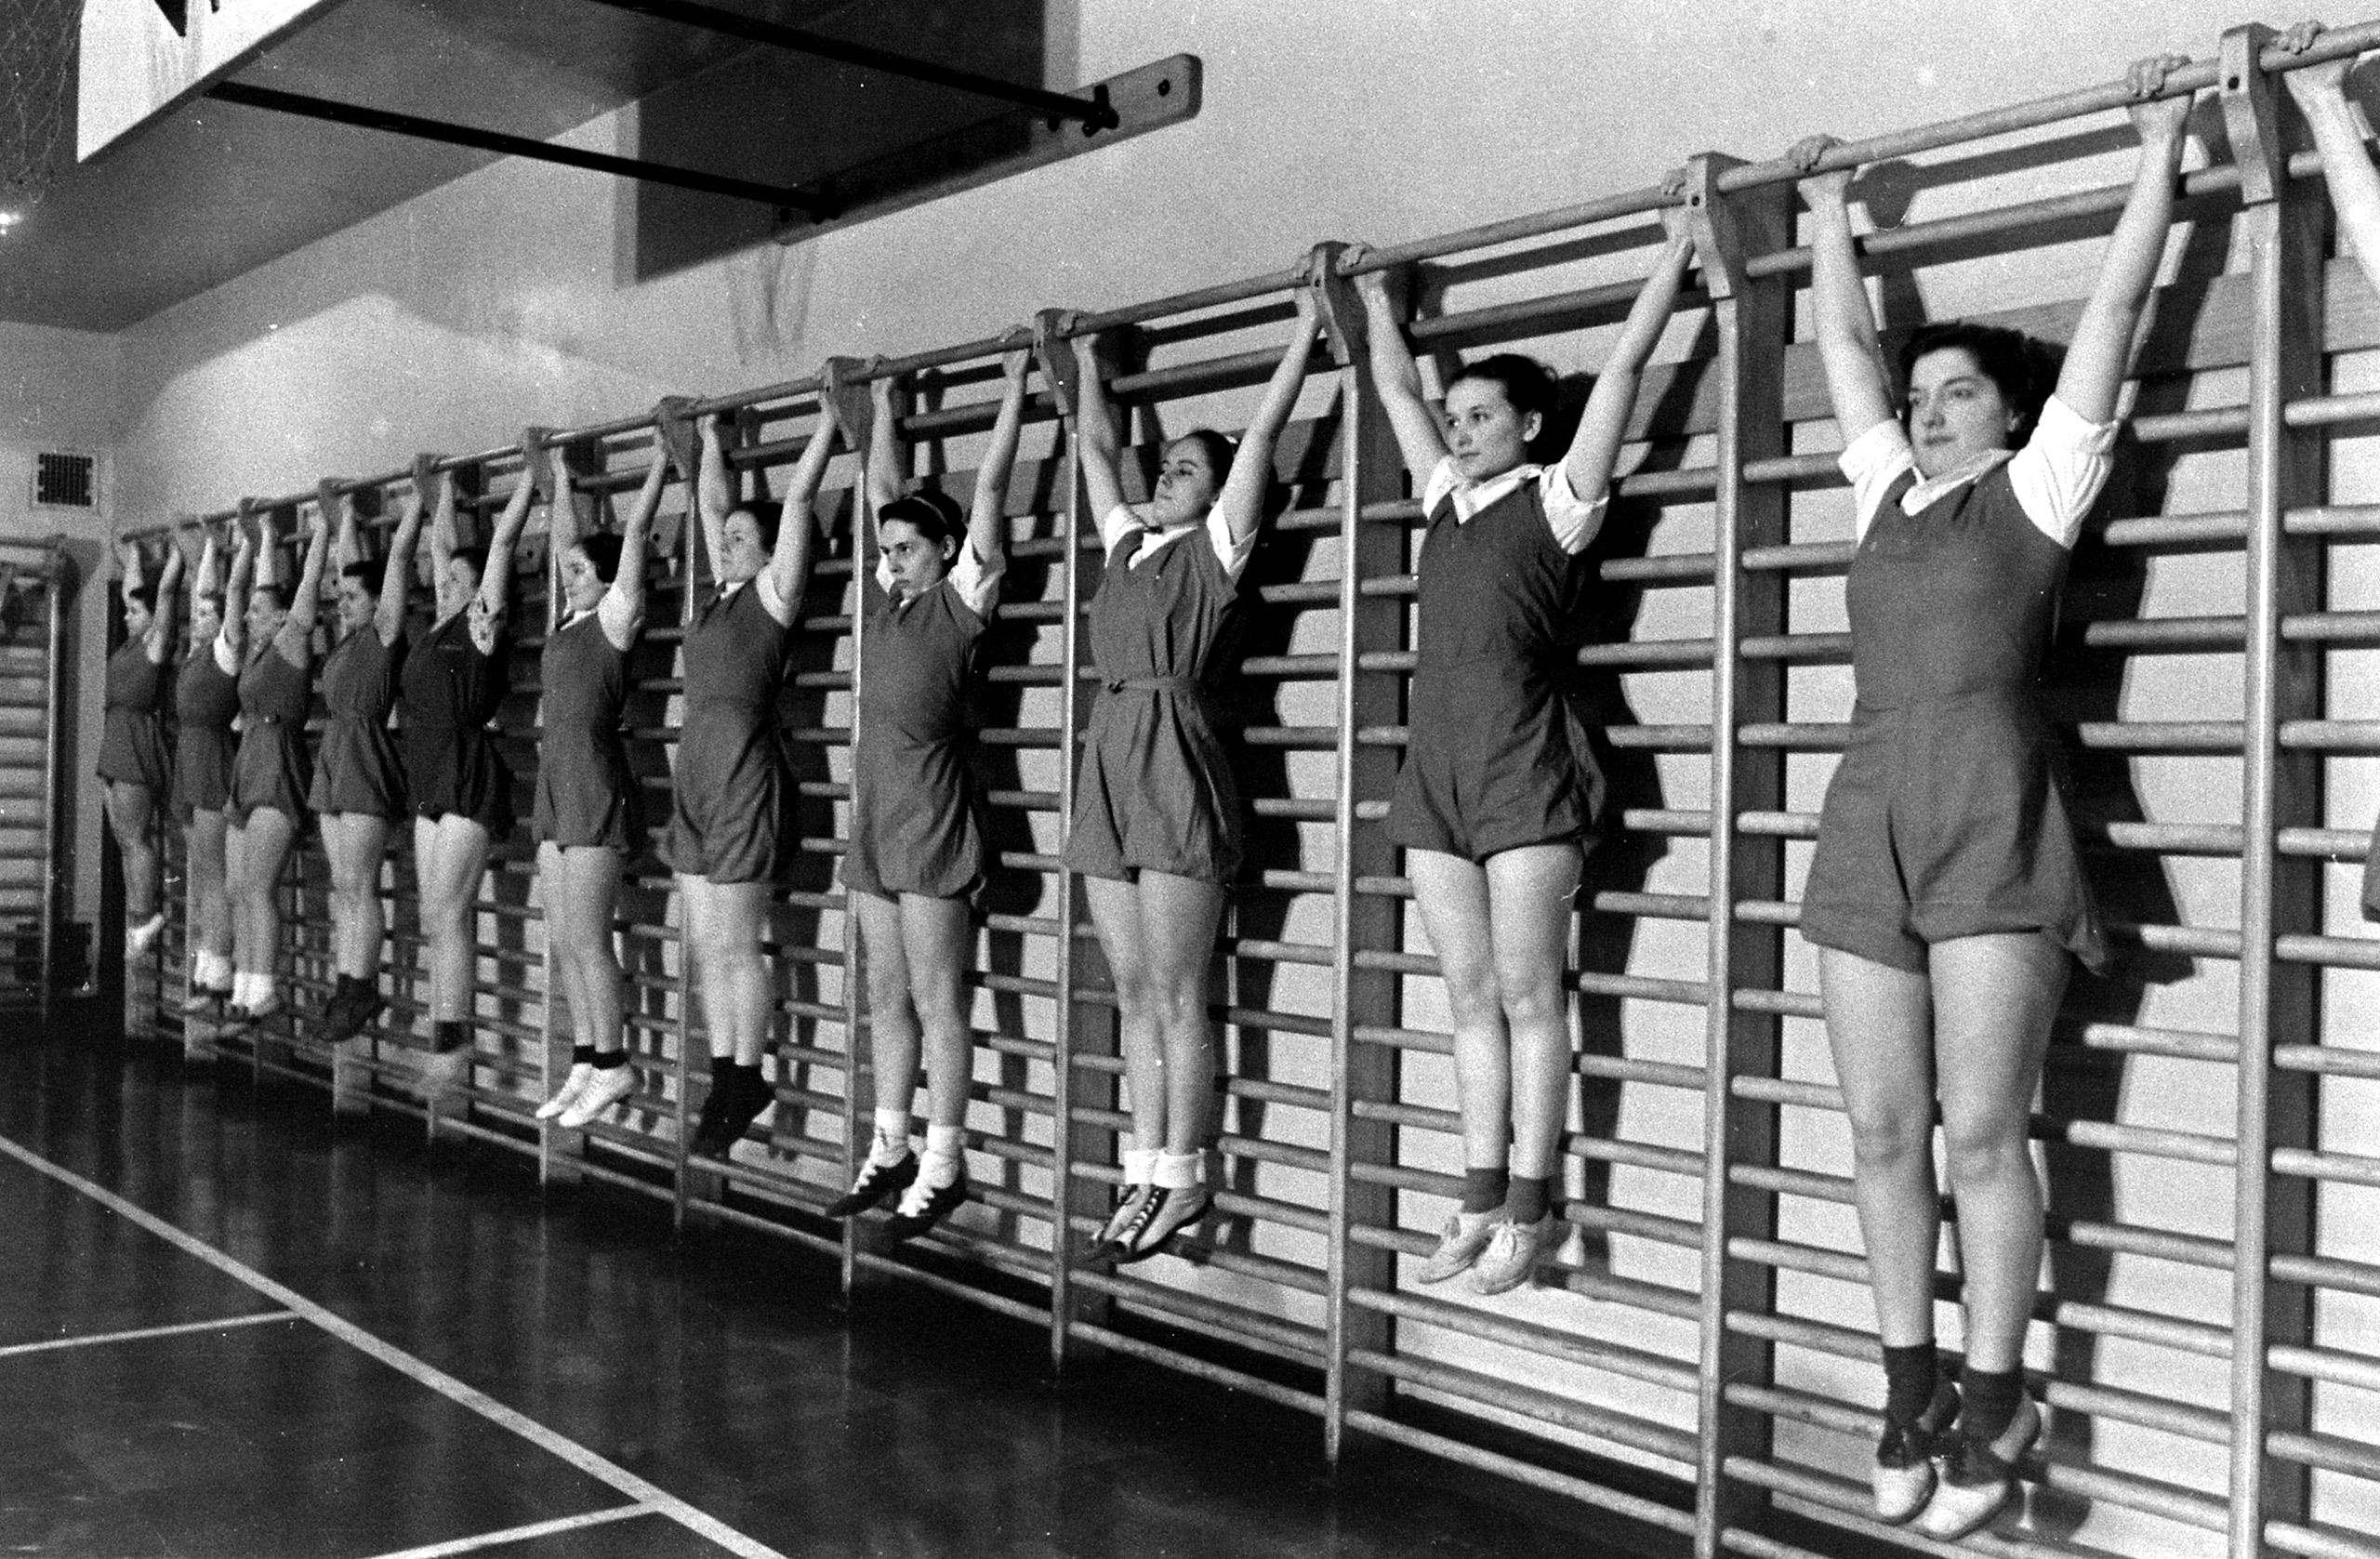 Student nurses at New York's Roosevelt Hospital, 1938.